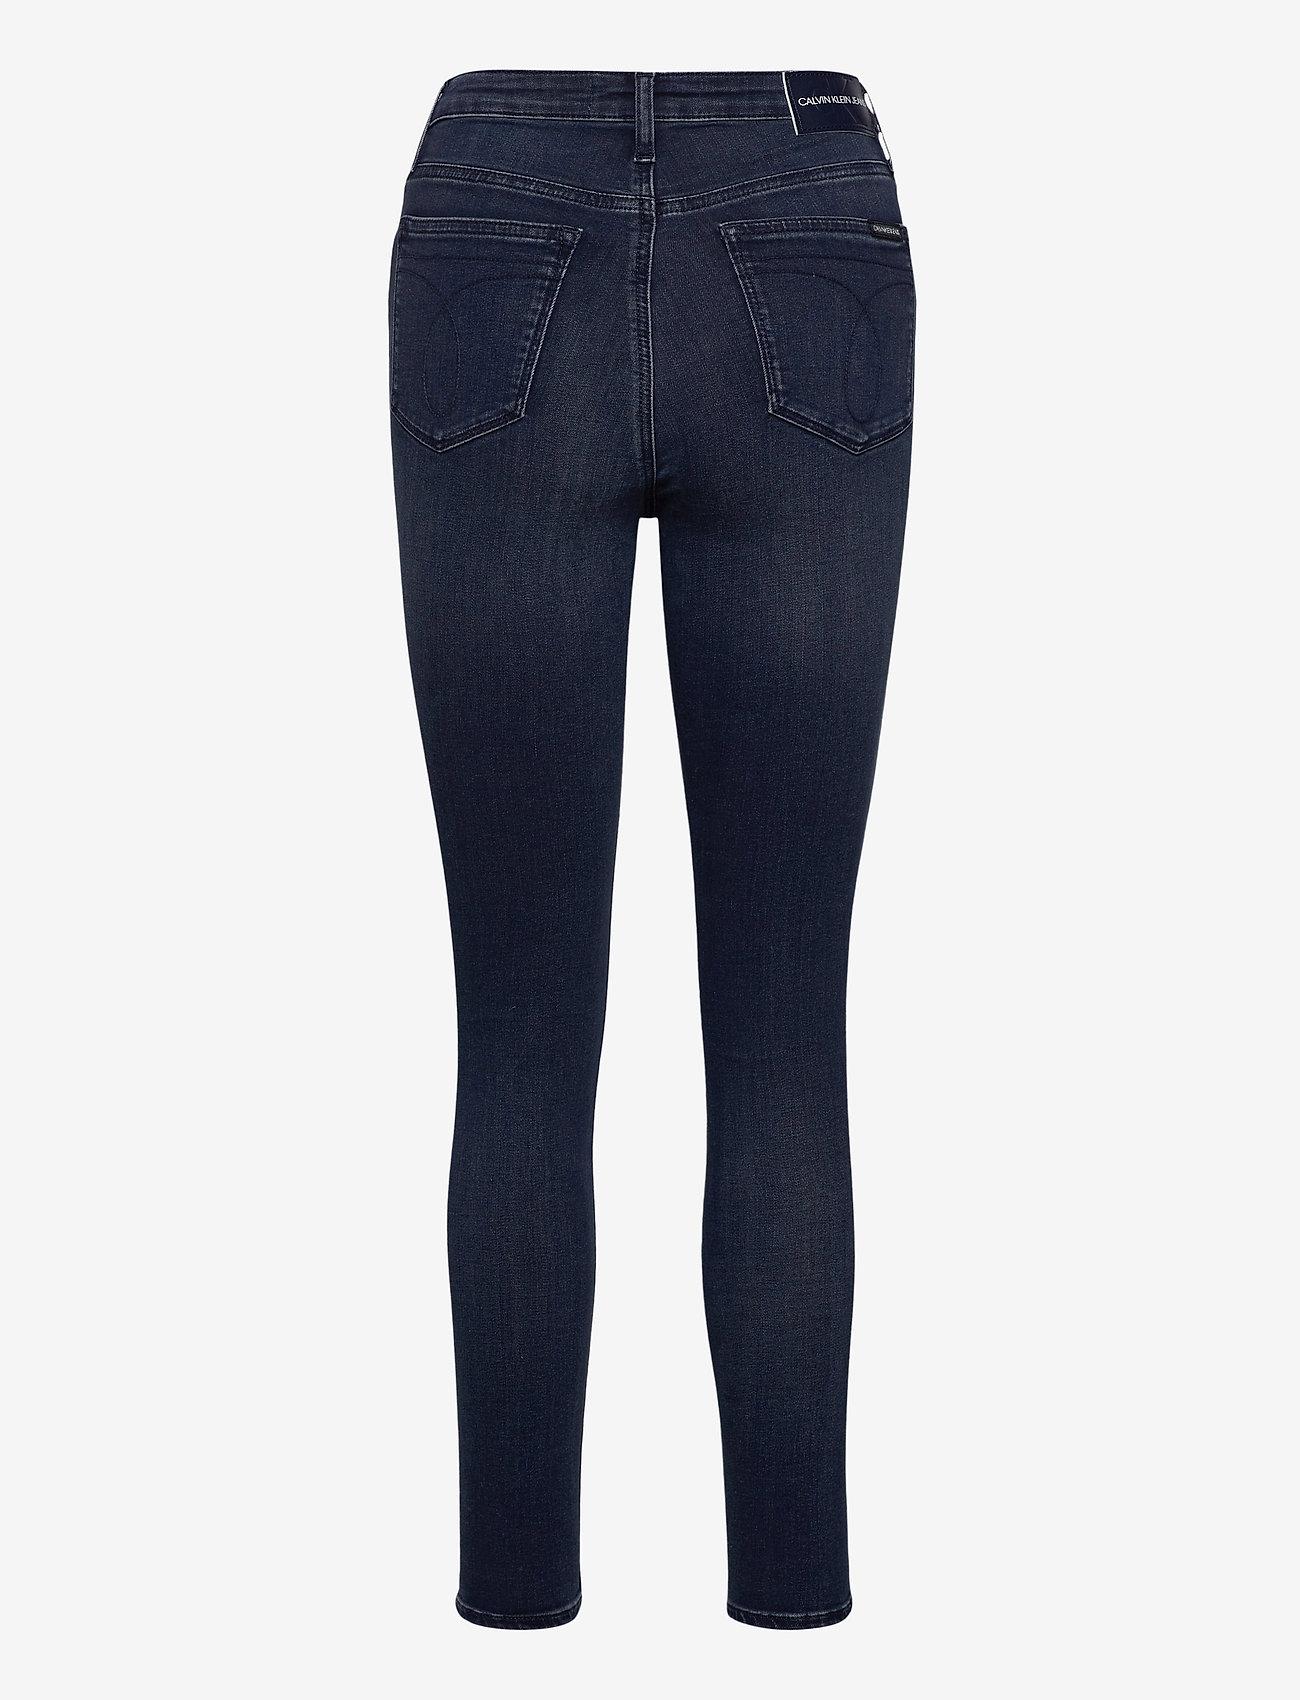 Calvin Klein Jeans - HIGH RISE SUPER SKINNY ANKLE - skinny jeans - denim dark - 1